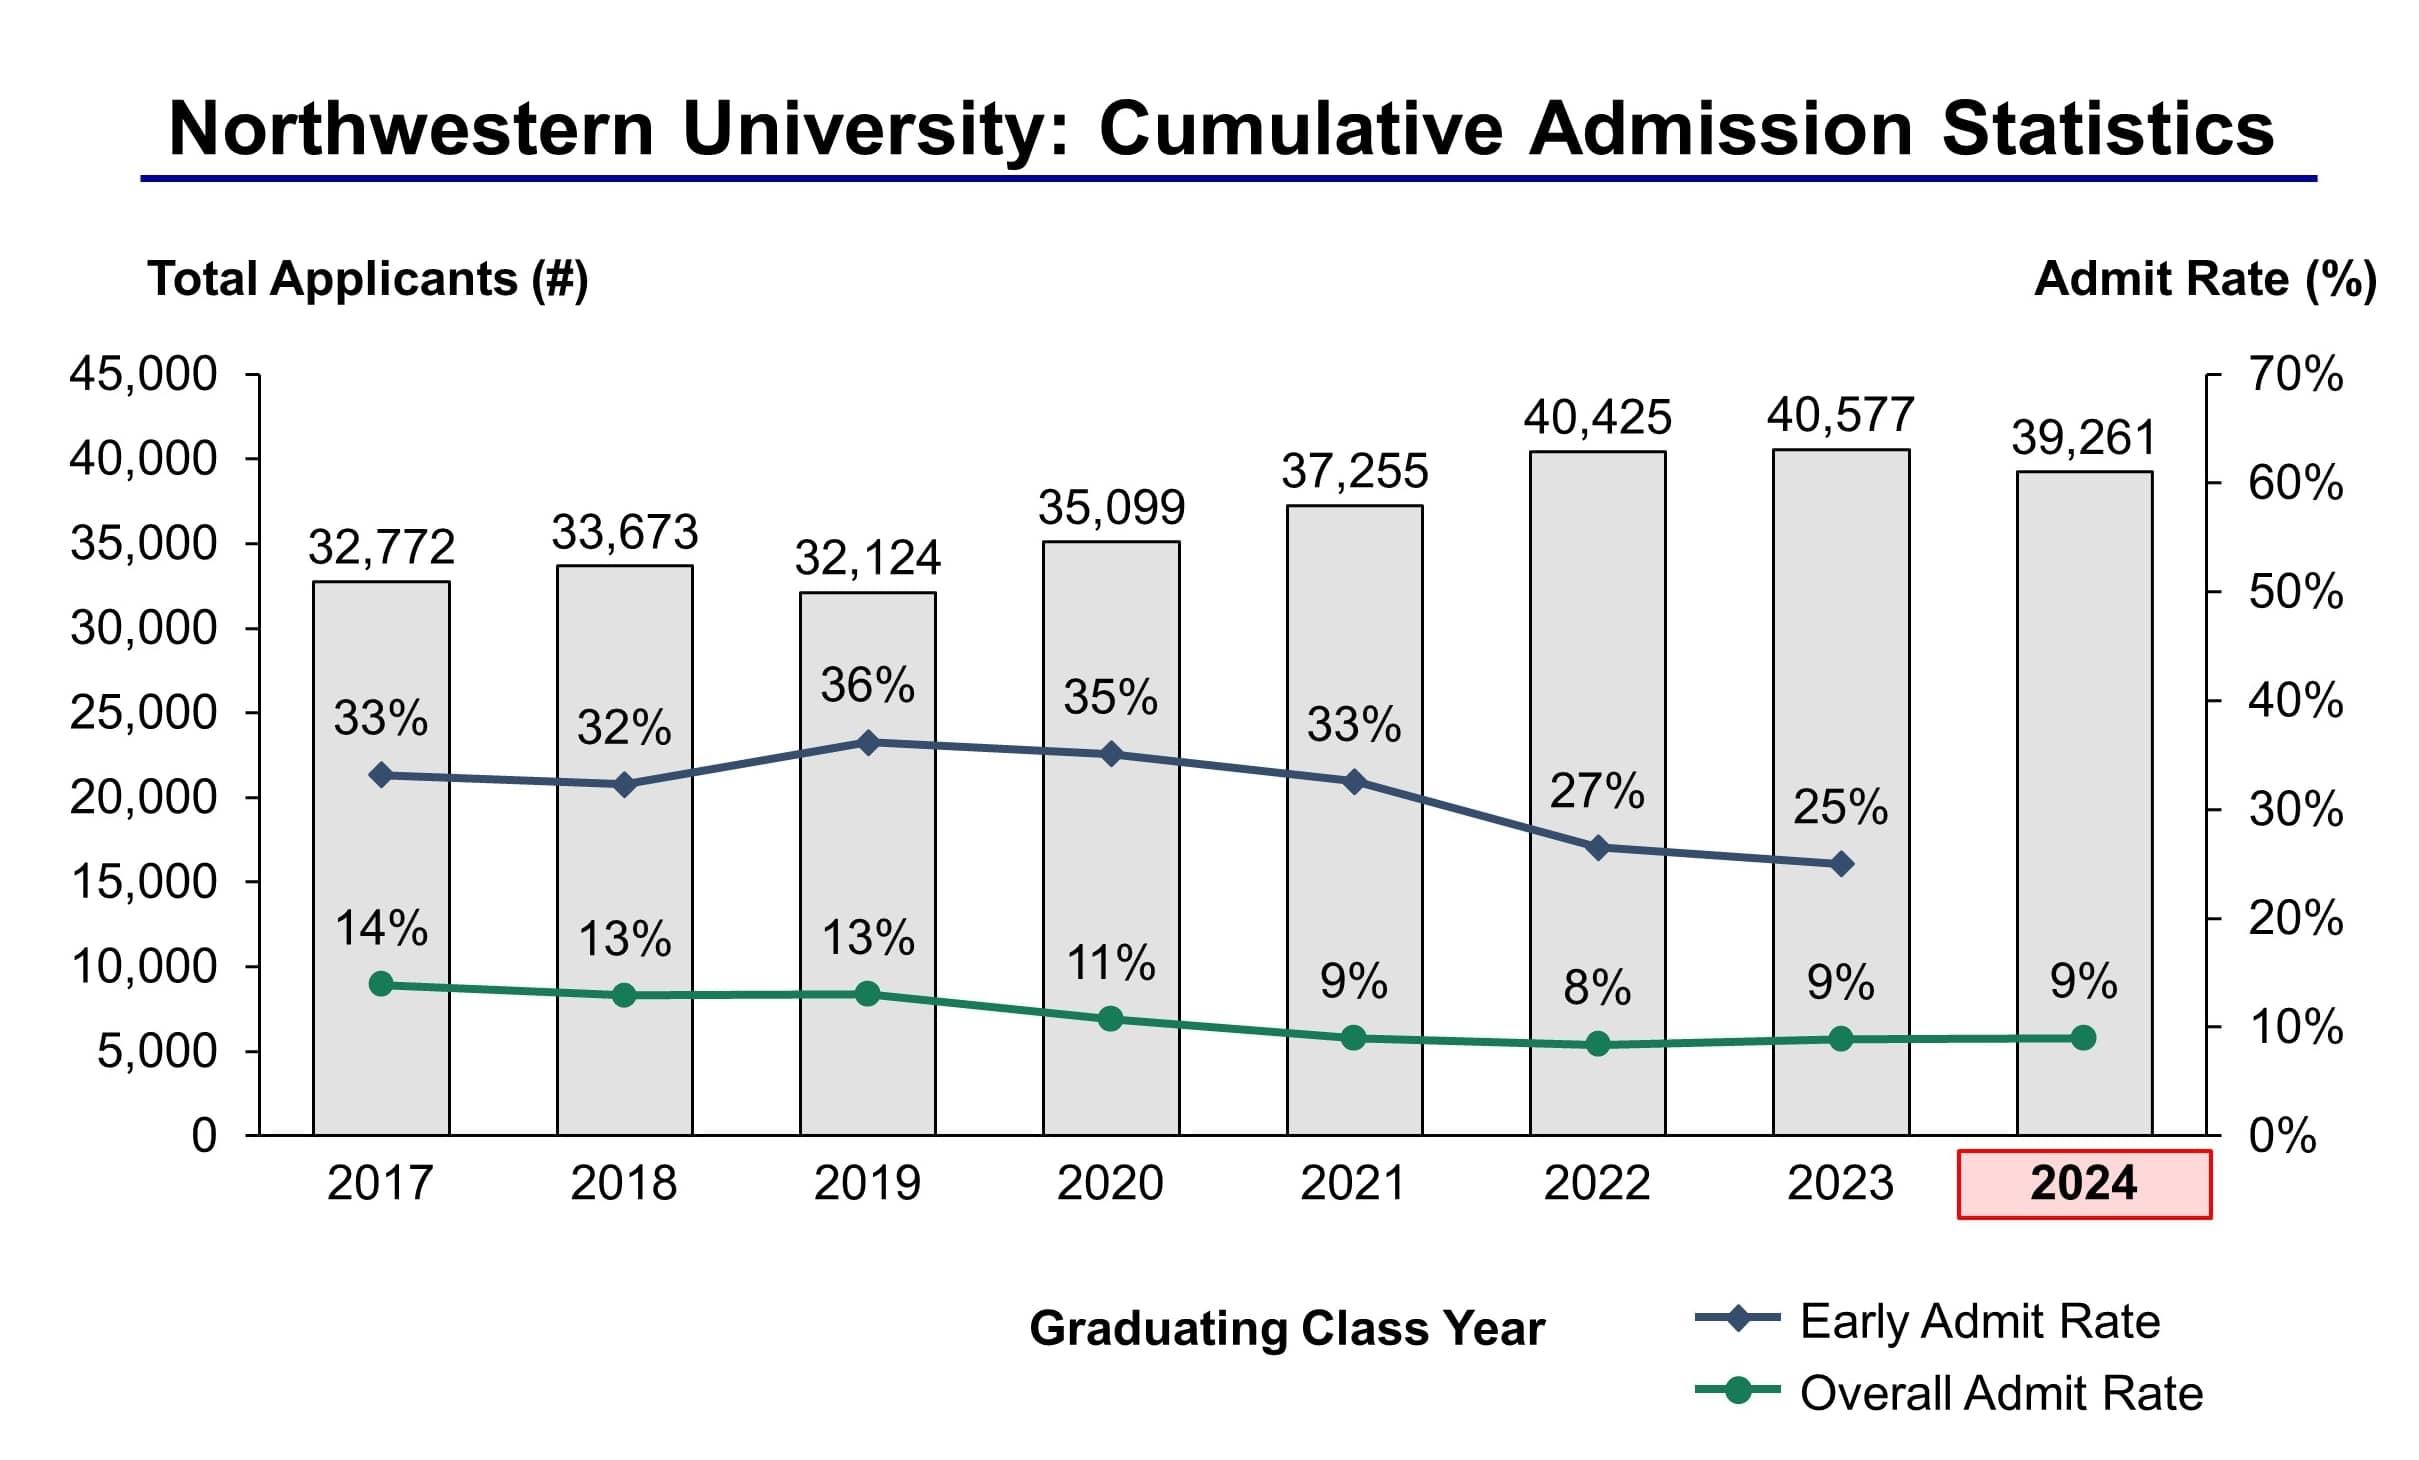 Northwestern University Calendar 2022.Northwestern University Admission Statistics Class Of 2024 Ivy League